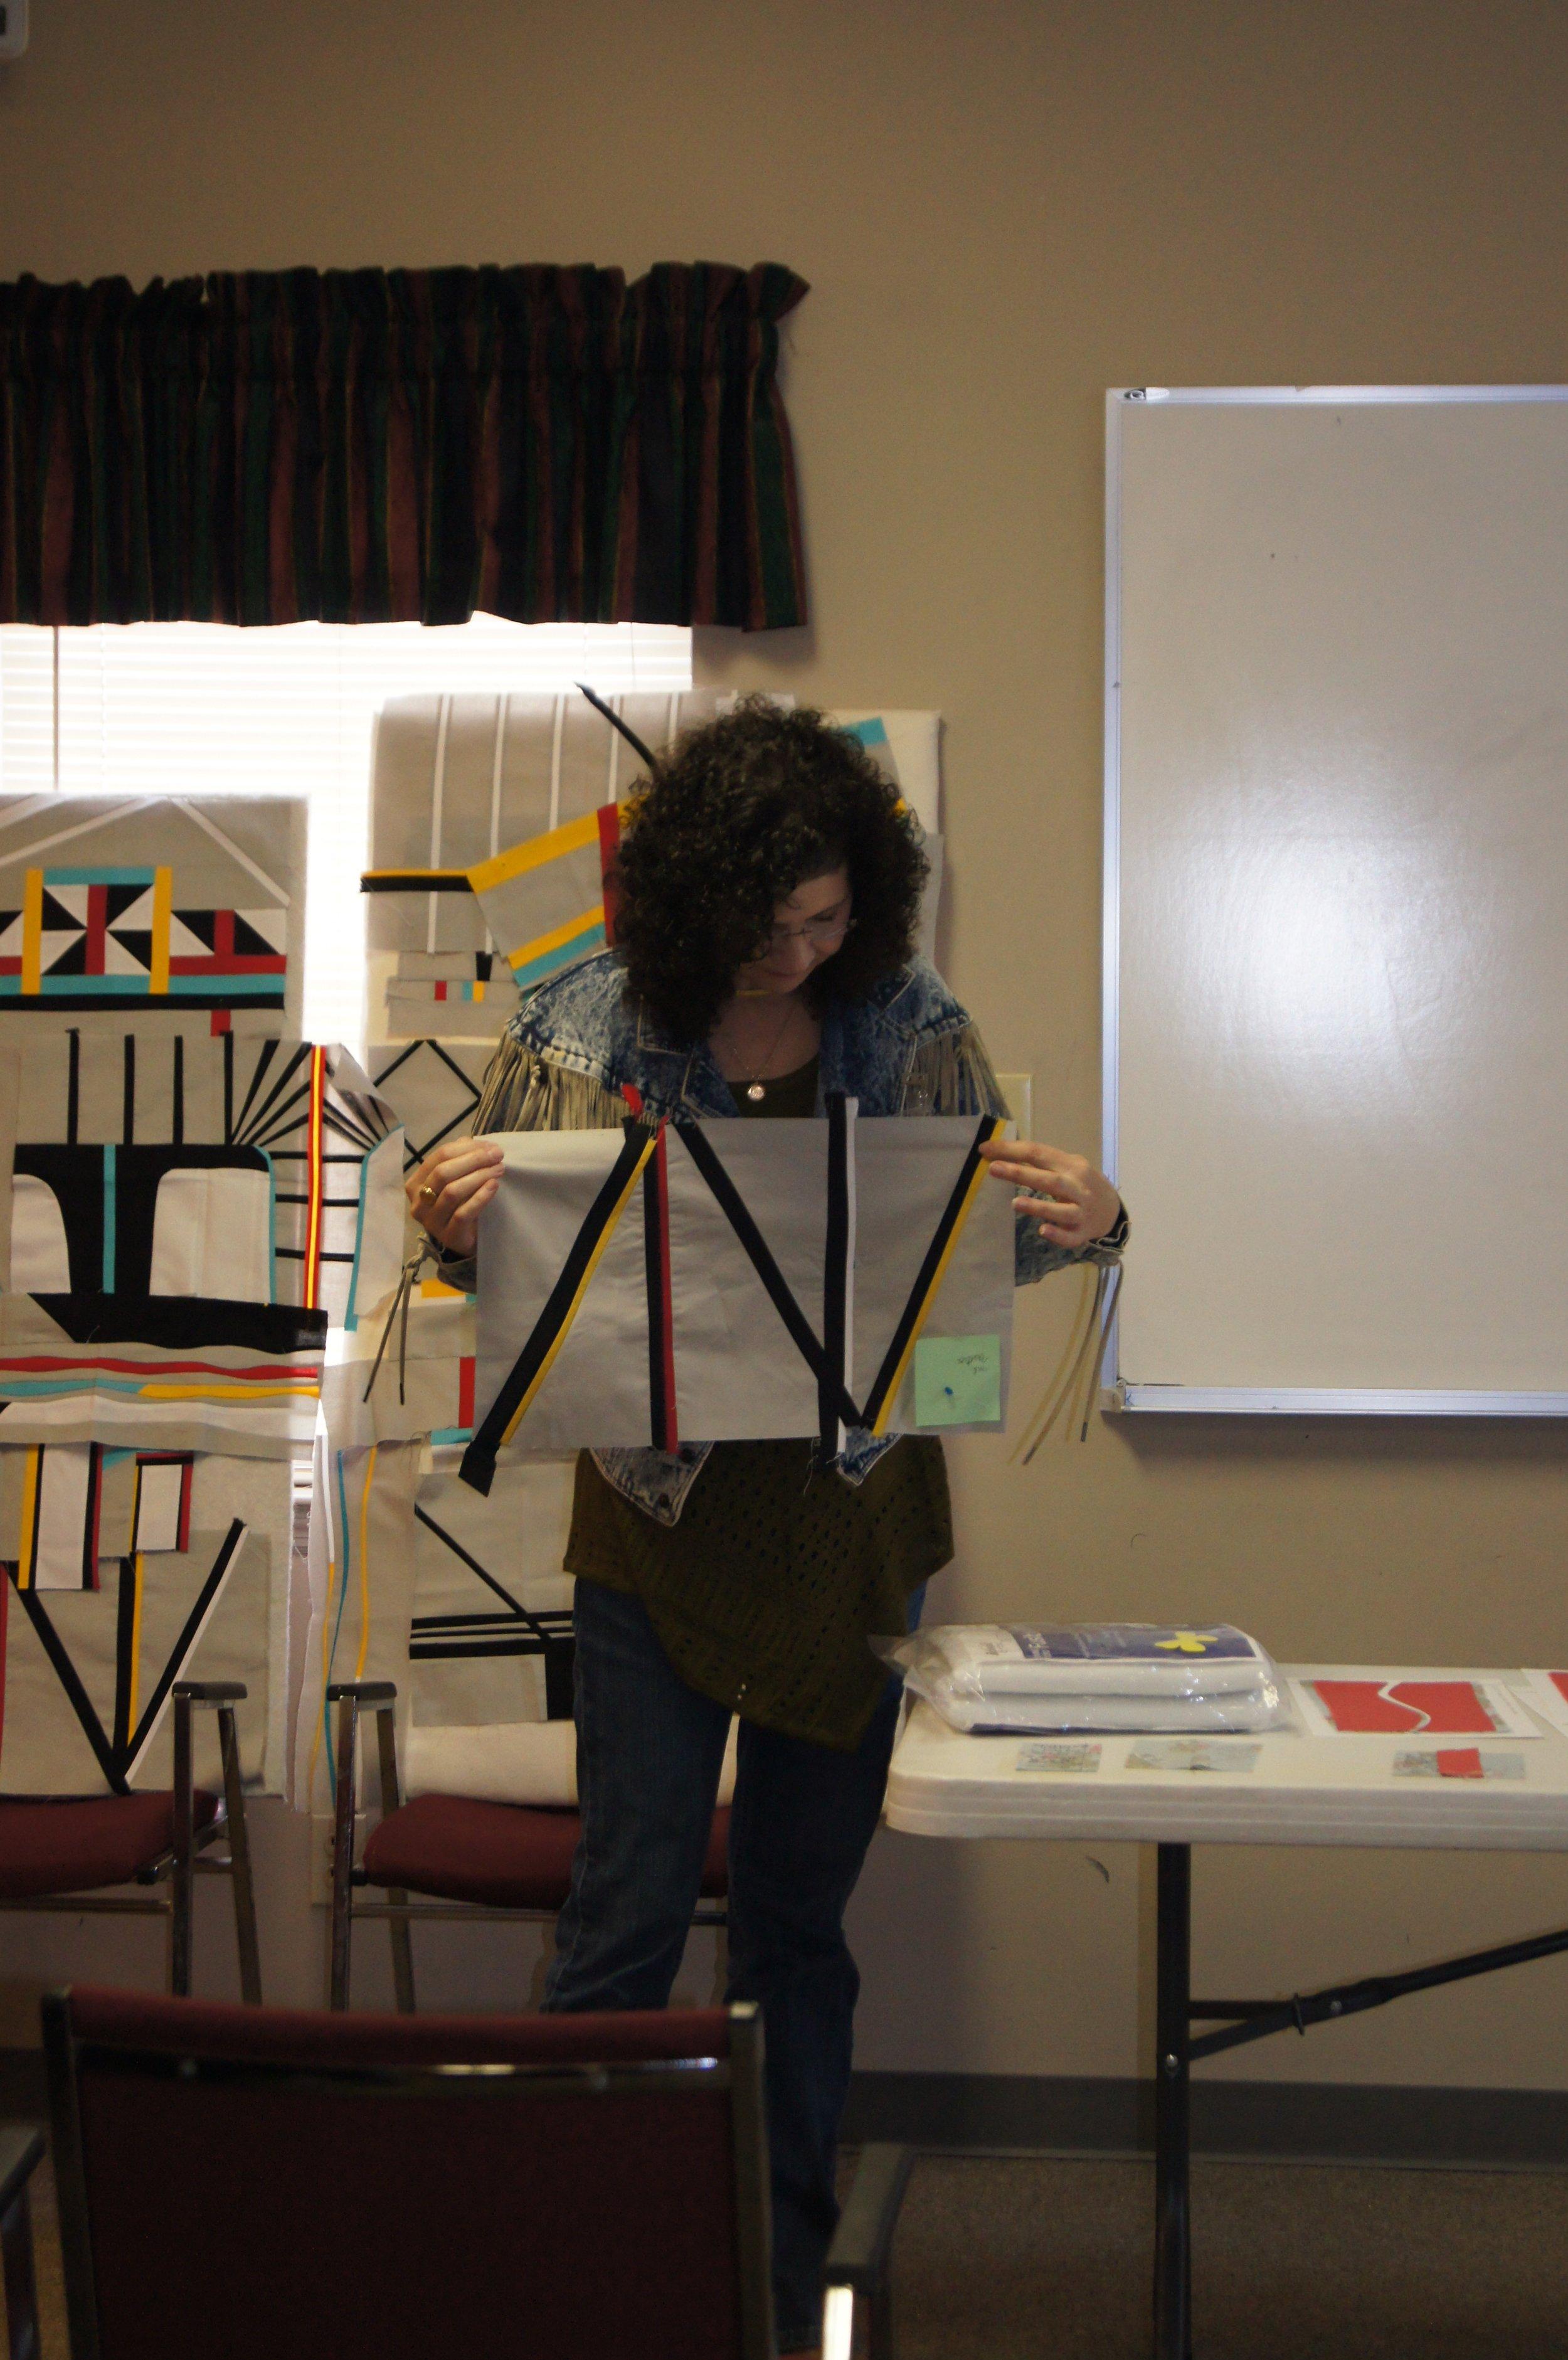 Improv practice by Melissa Klingensmith